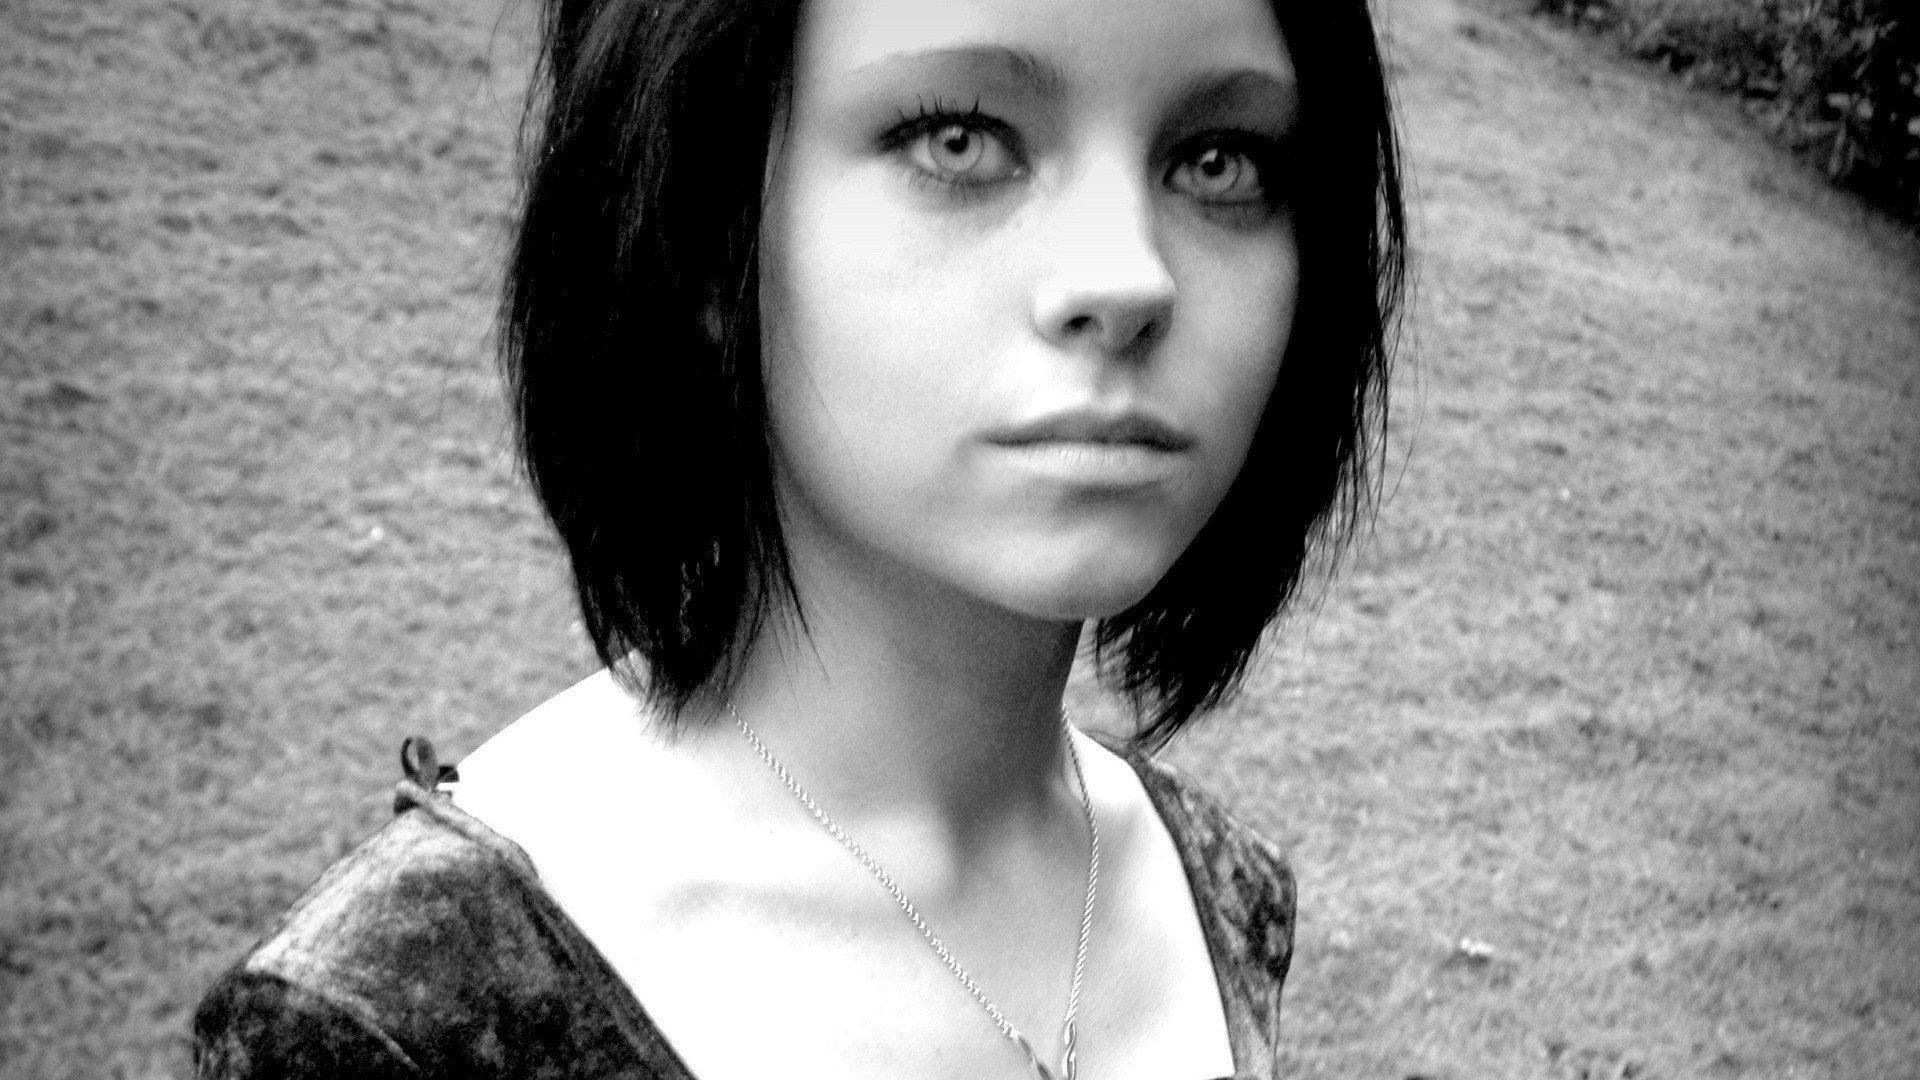 Black And White Eyes Black Hair Emo Girl Toni Pearce Wallpaper